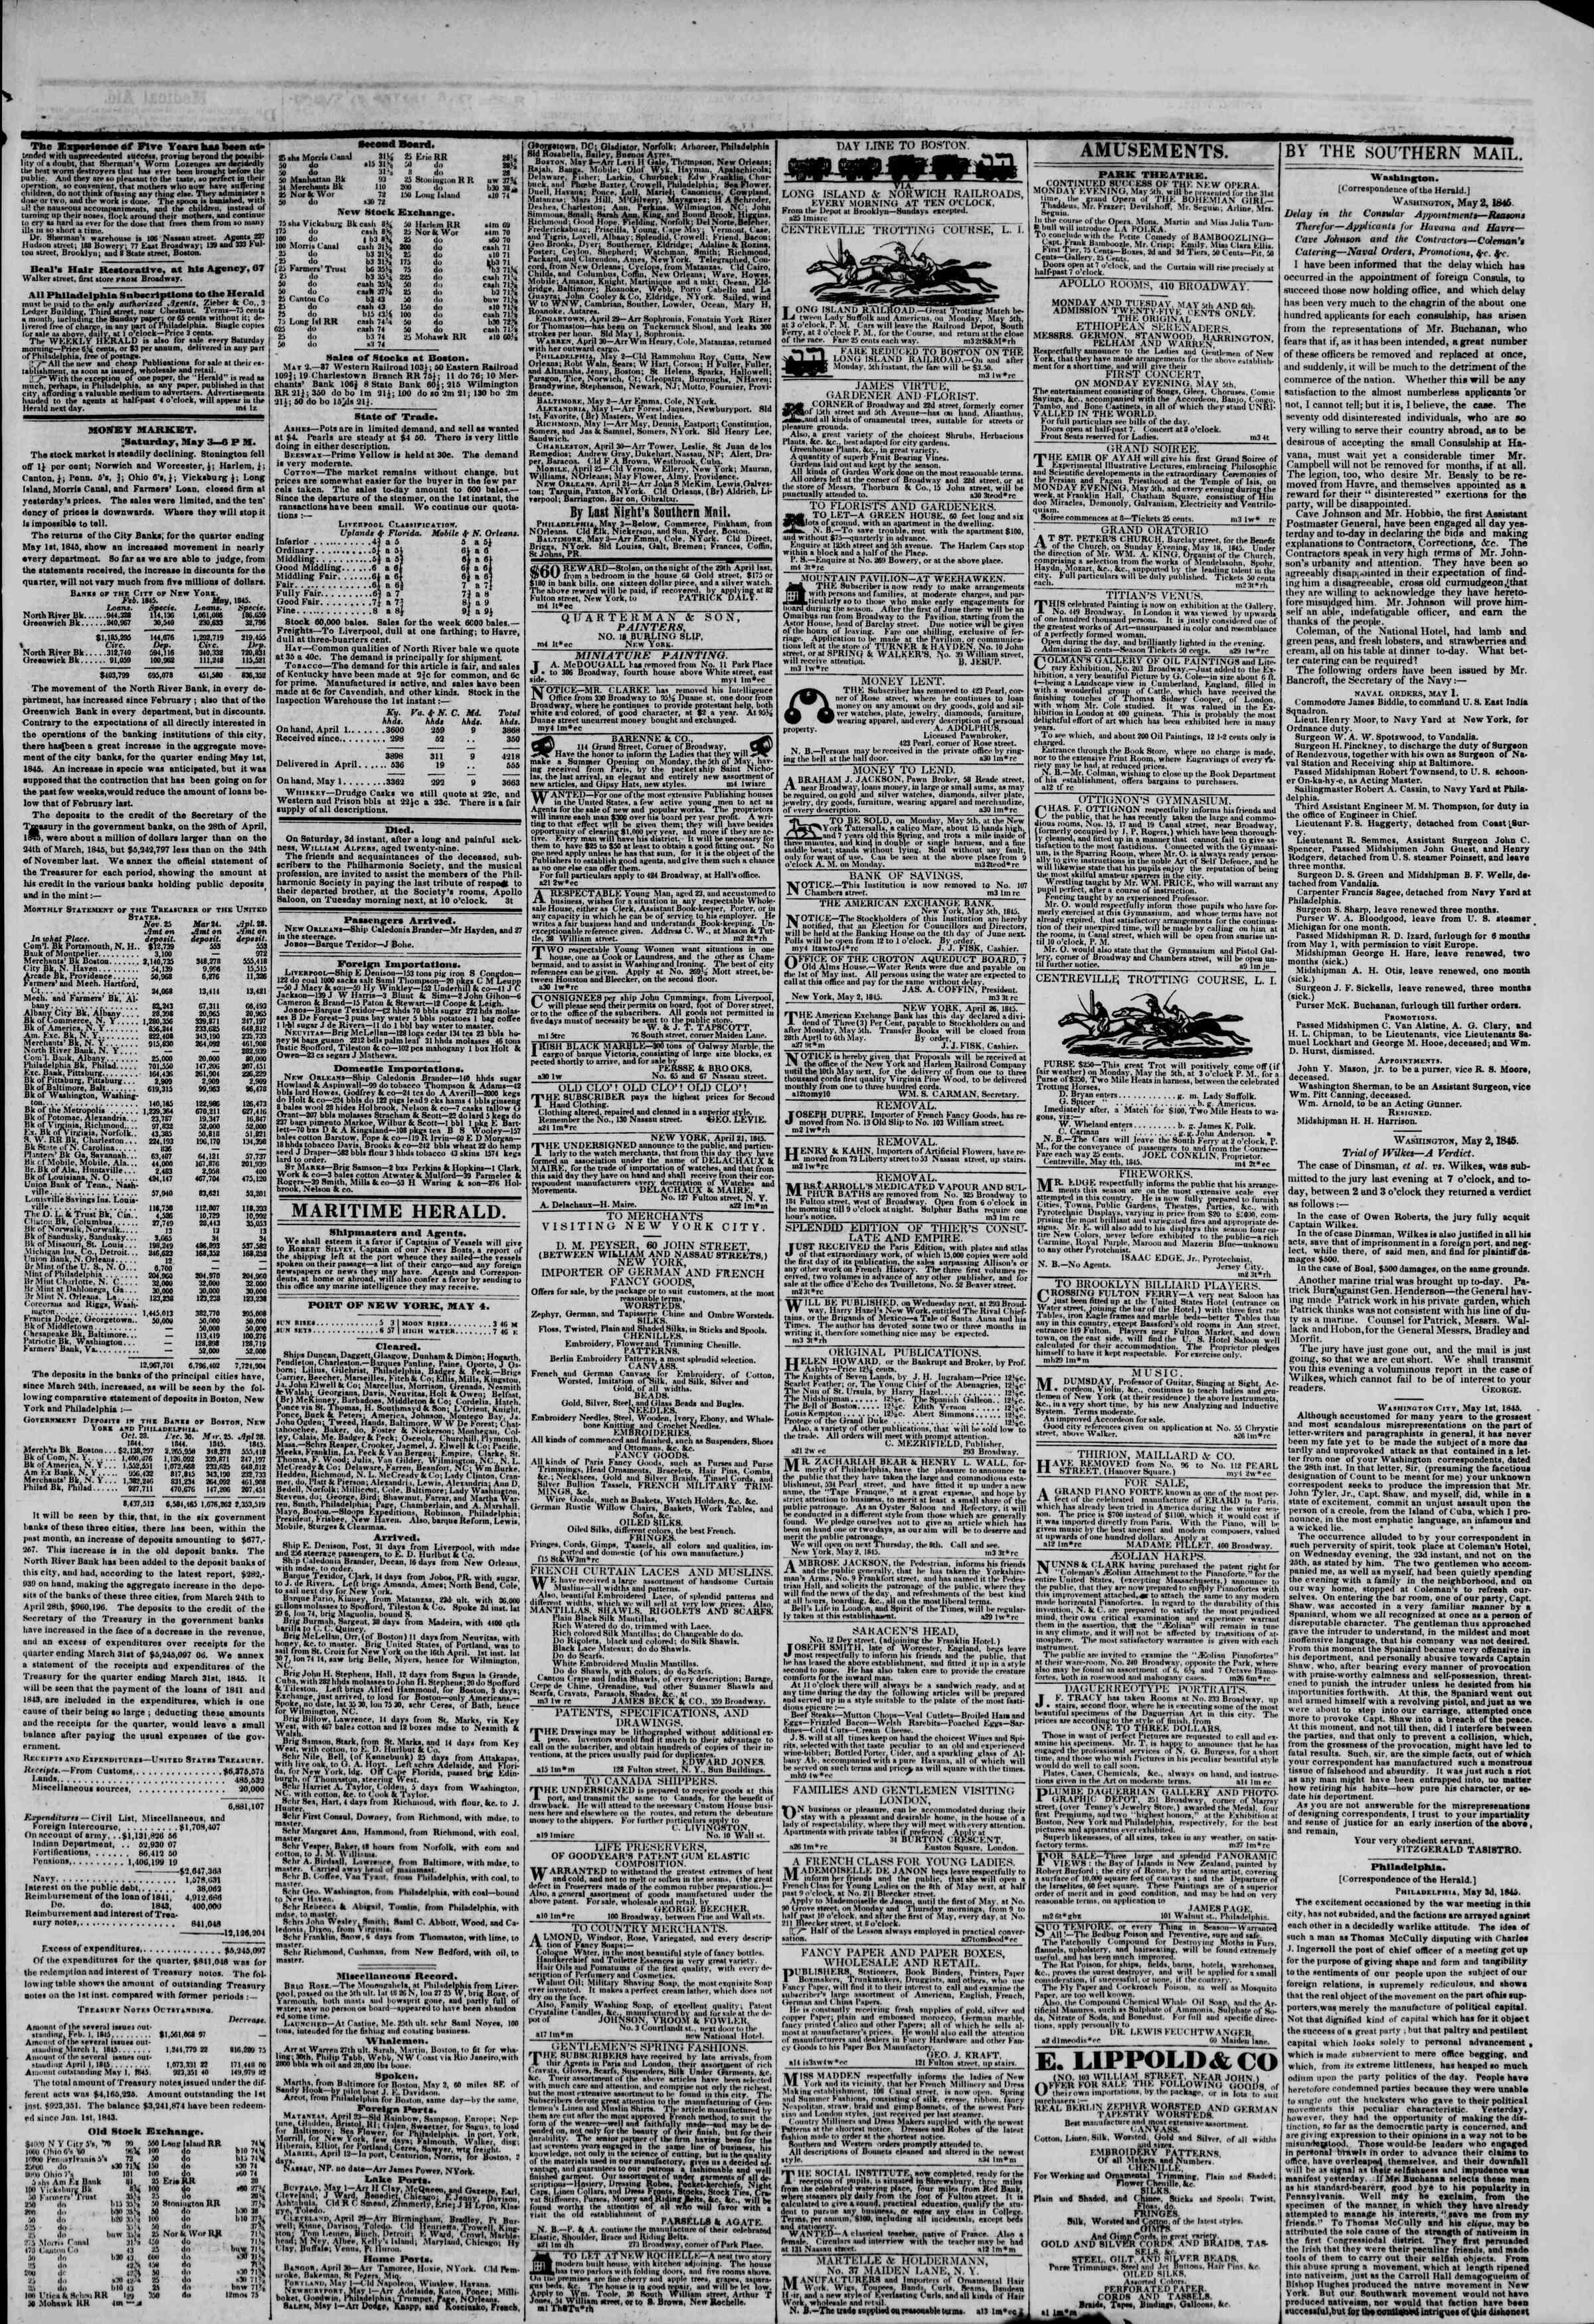 May 4, 1845 Tarihli The New York Herald Gazetesi Sayfa 3